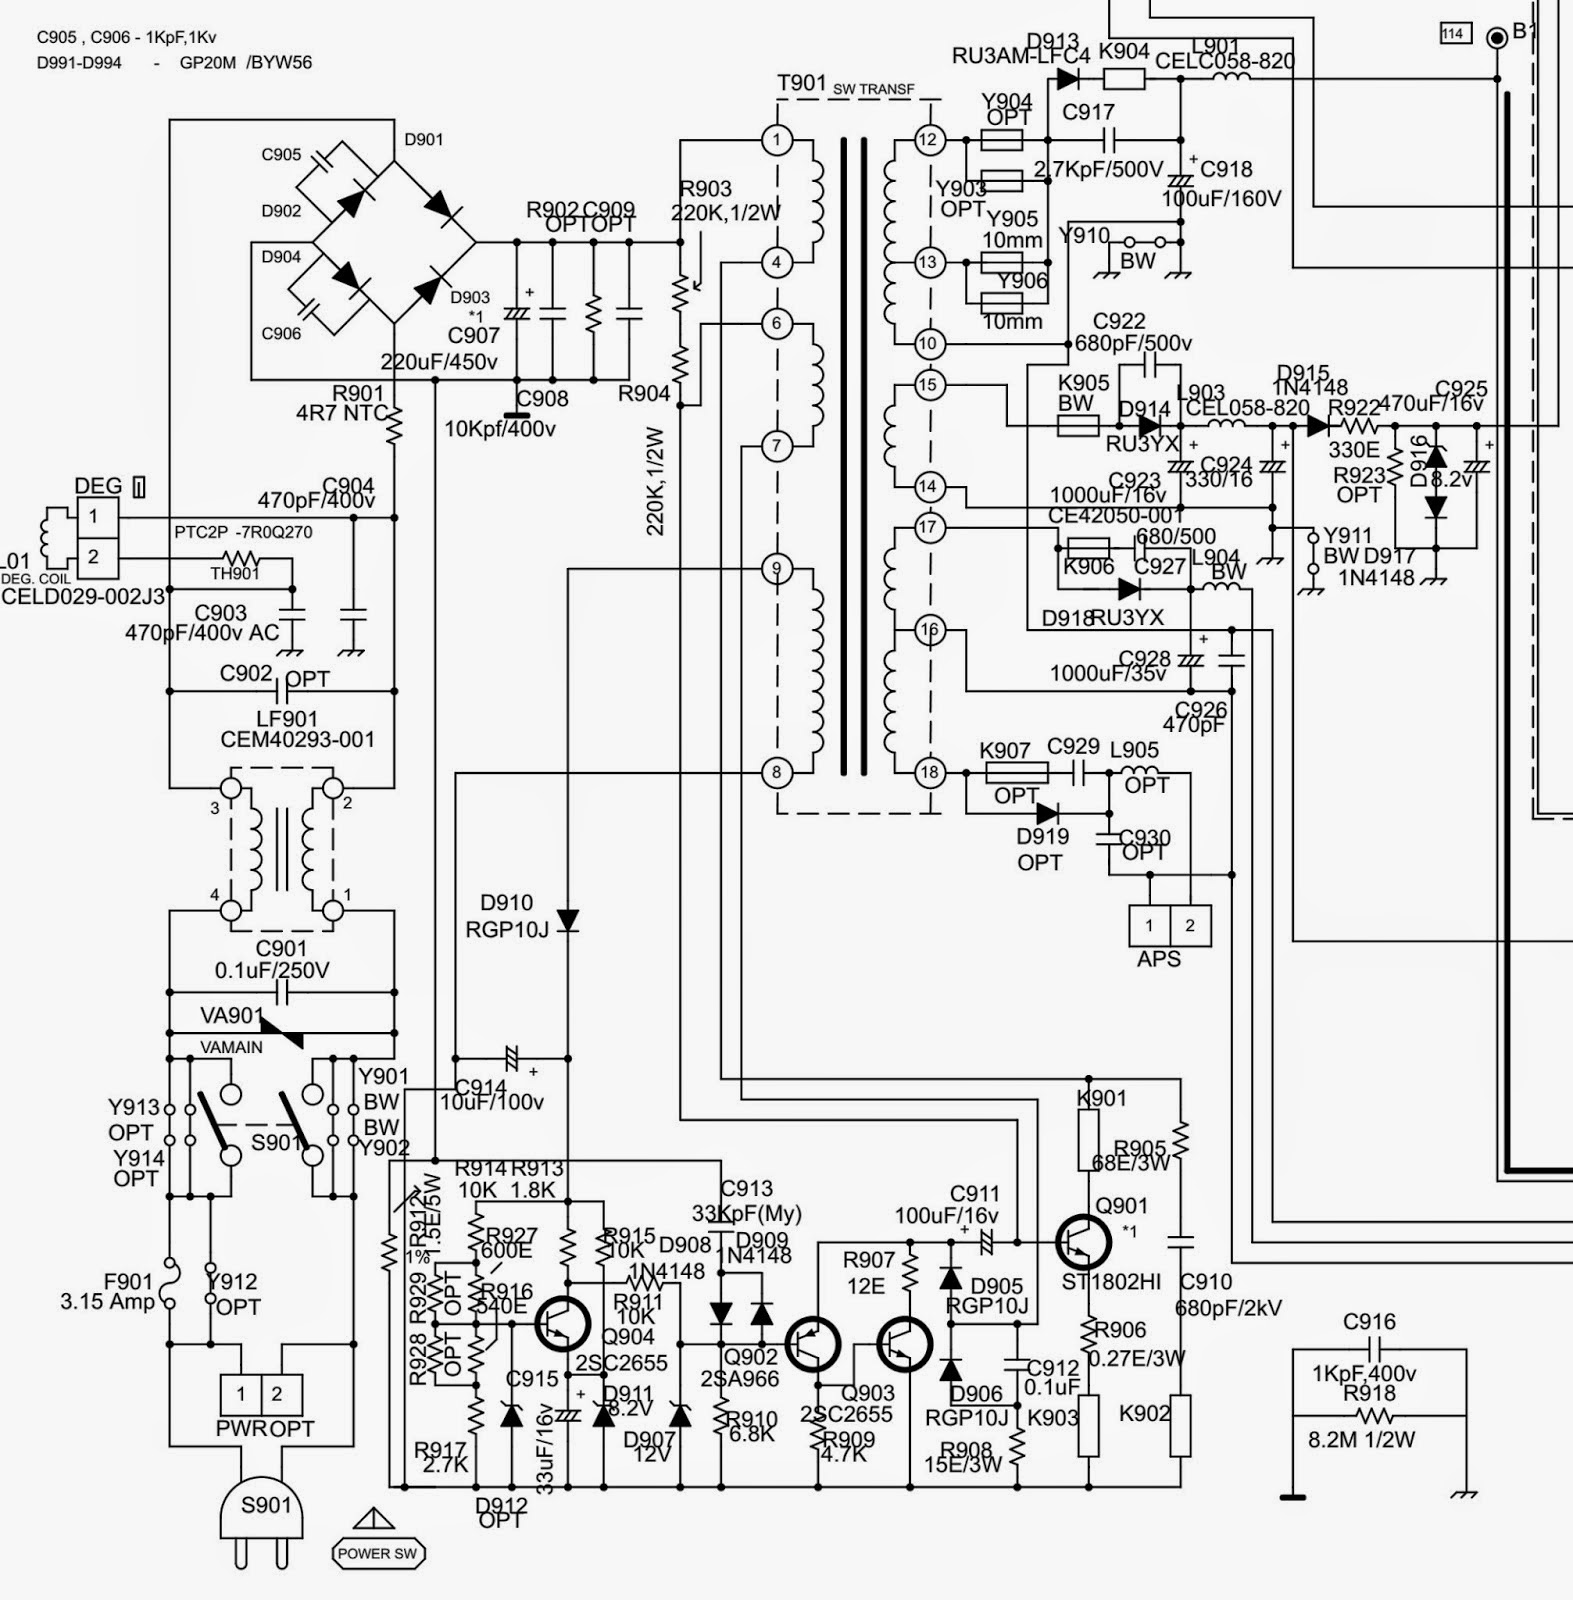 b w tv circuit diagram wiring library rh 92 dirtytalk camgirls de led tv inverter board circuit [ 1573 x 1600 Pixel ]